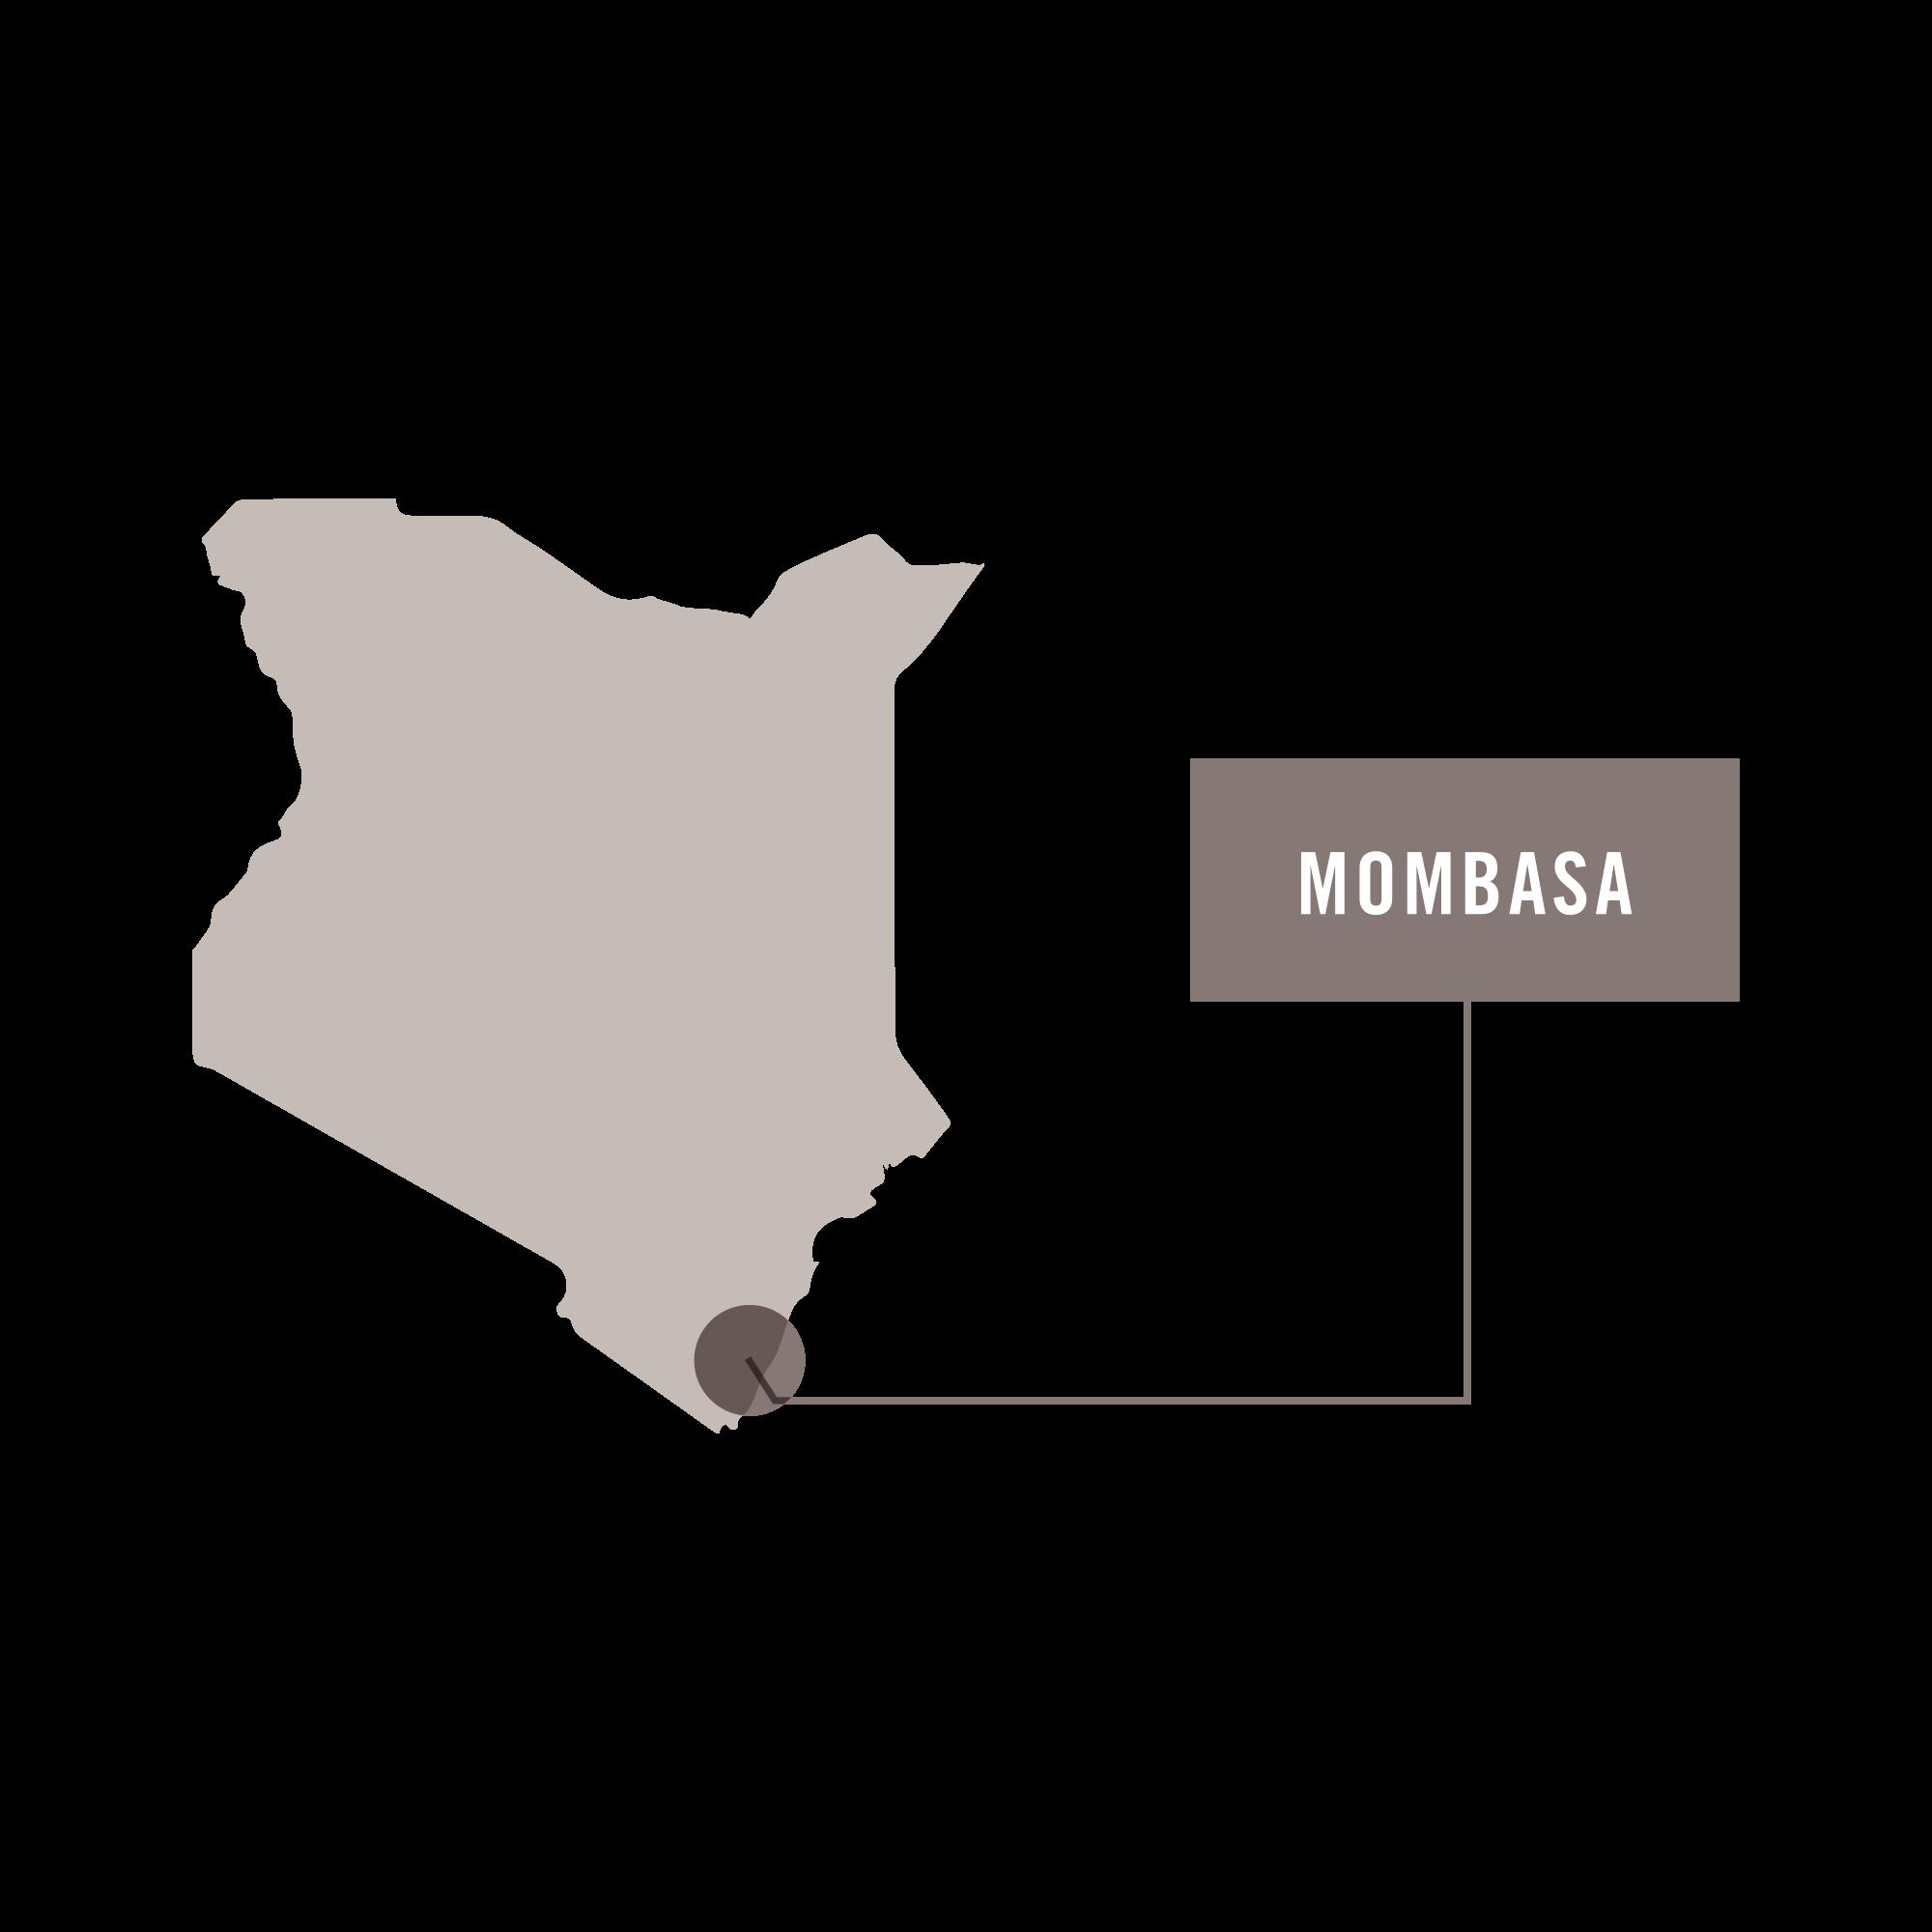 mombasa.png